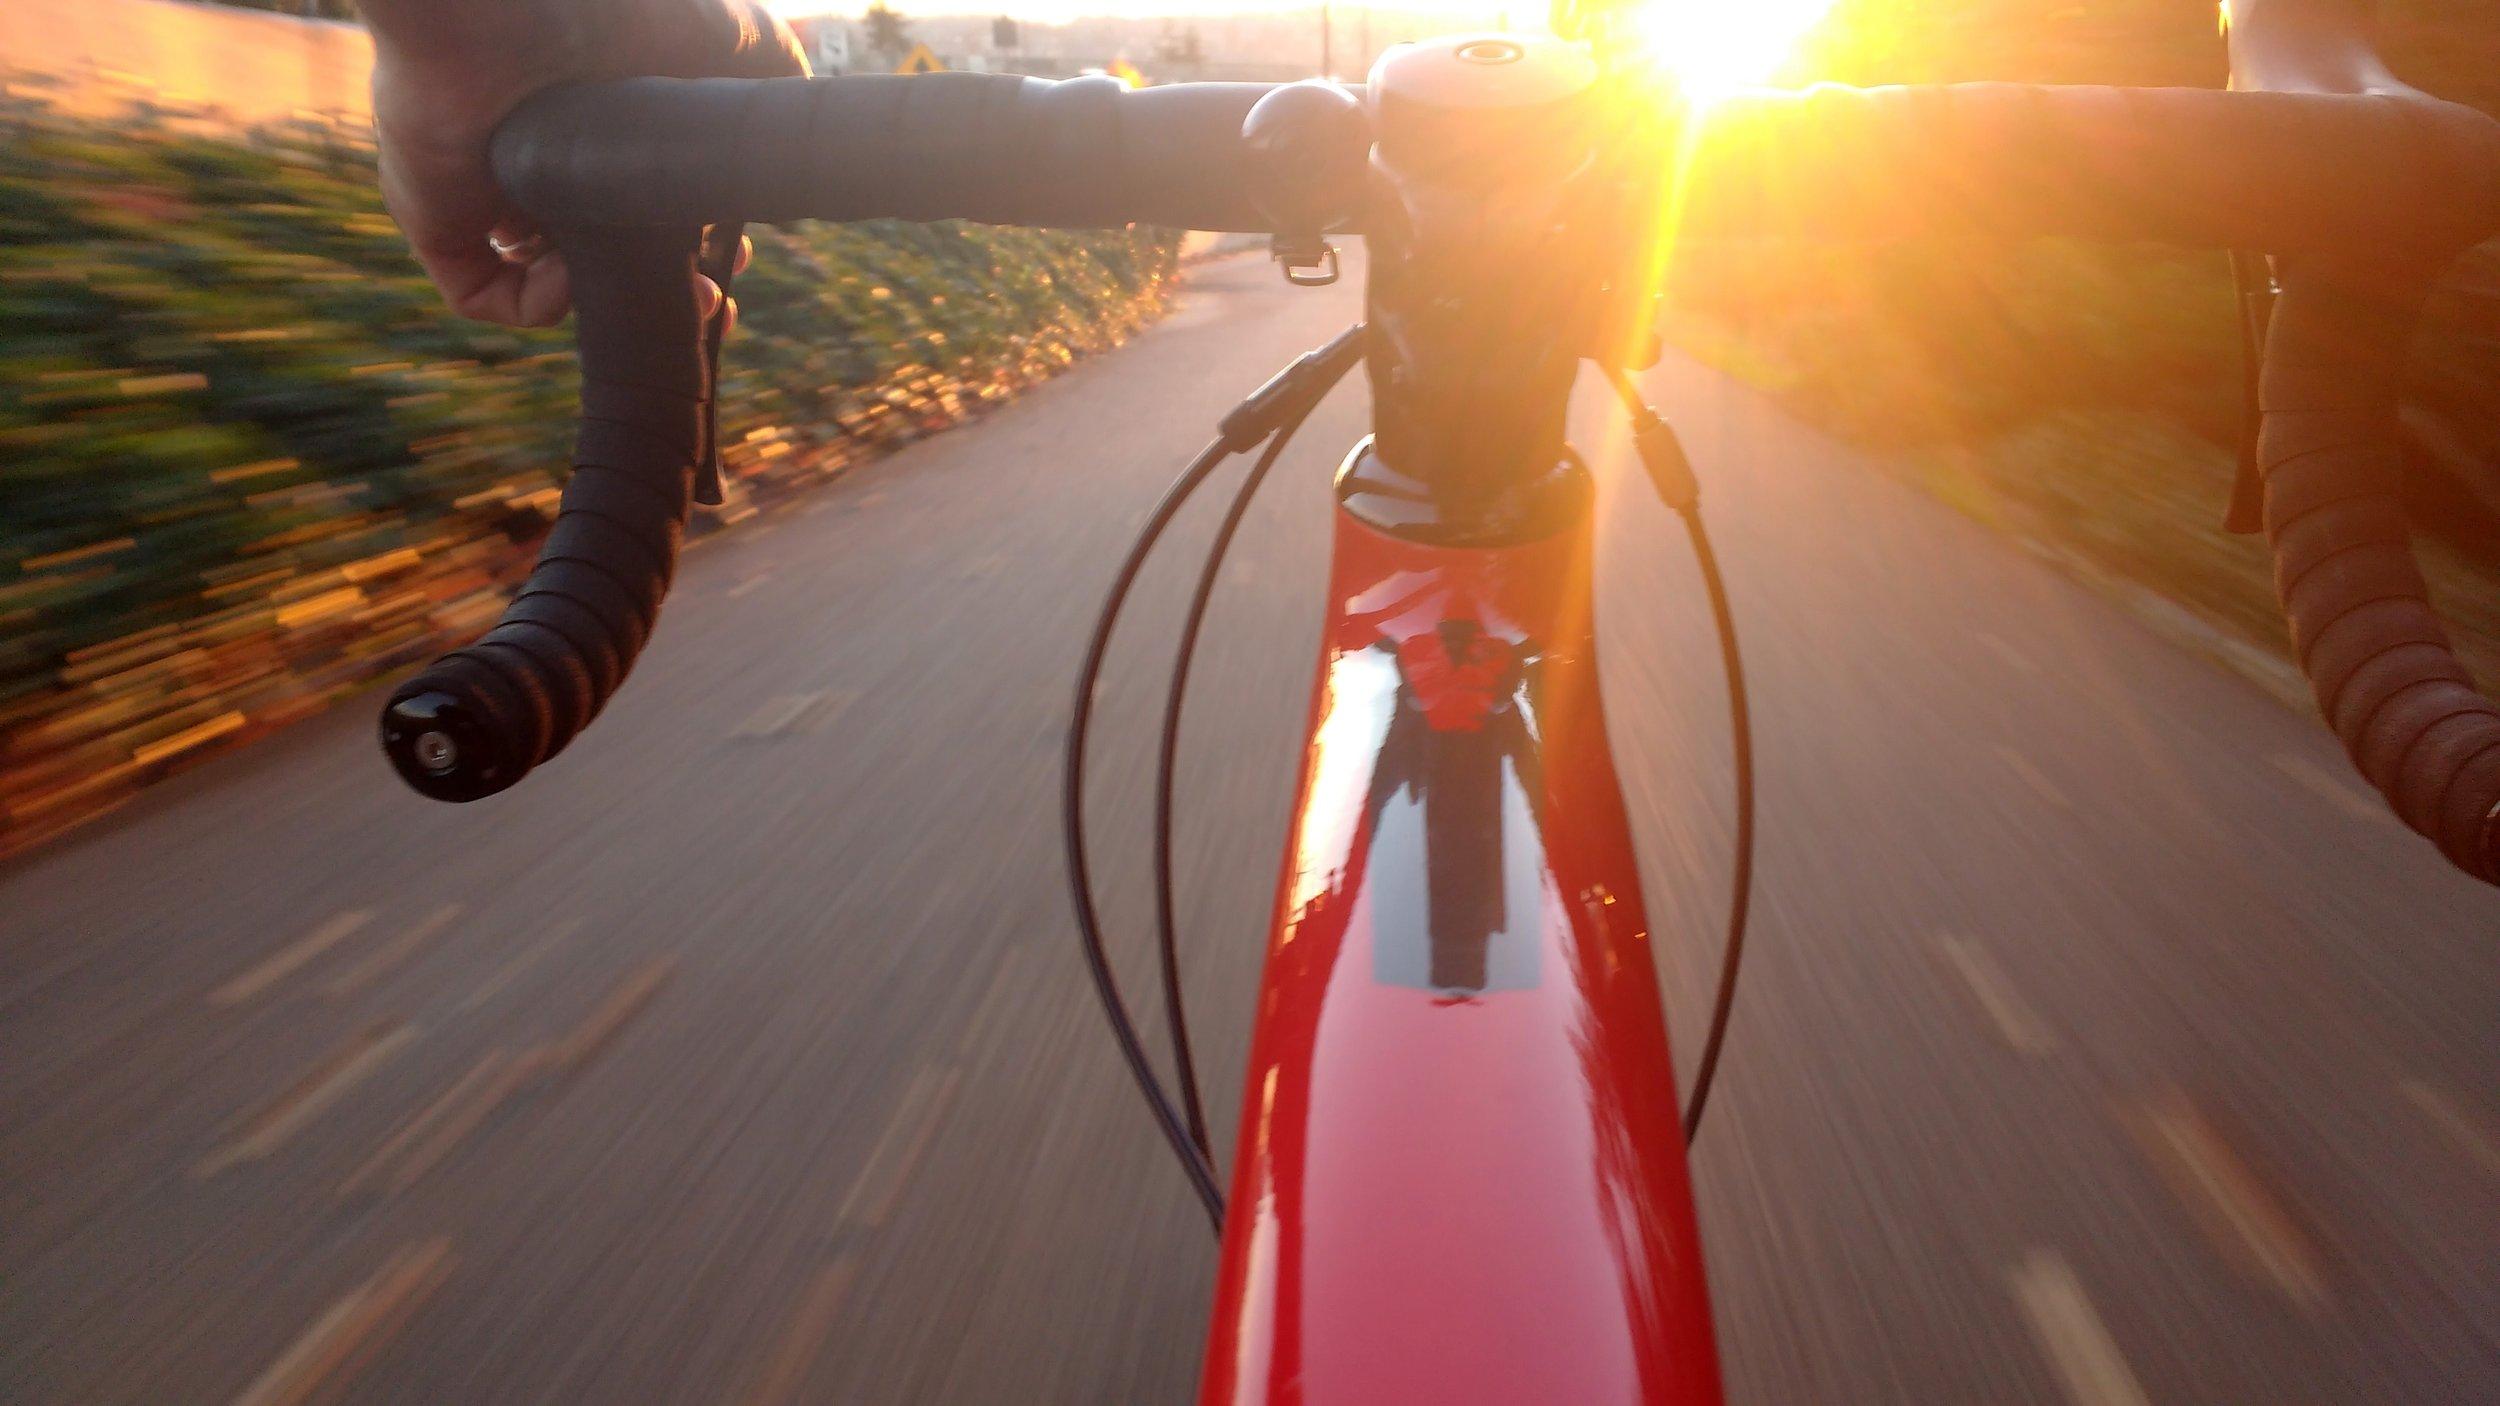 action-bicycling-bike-287398.jpg